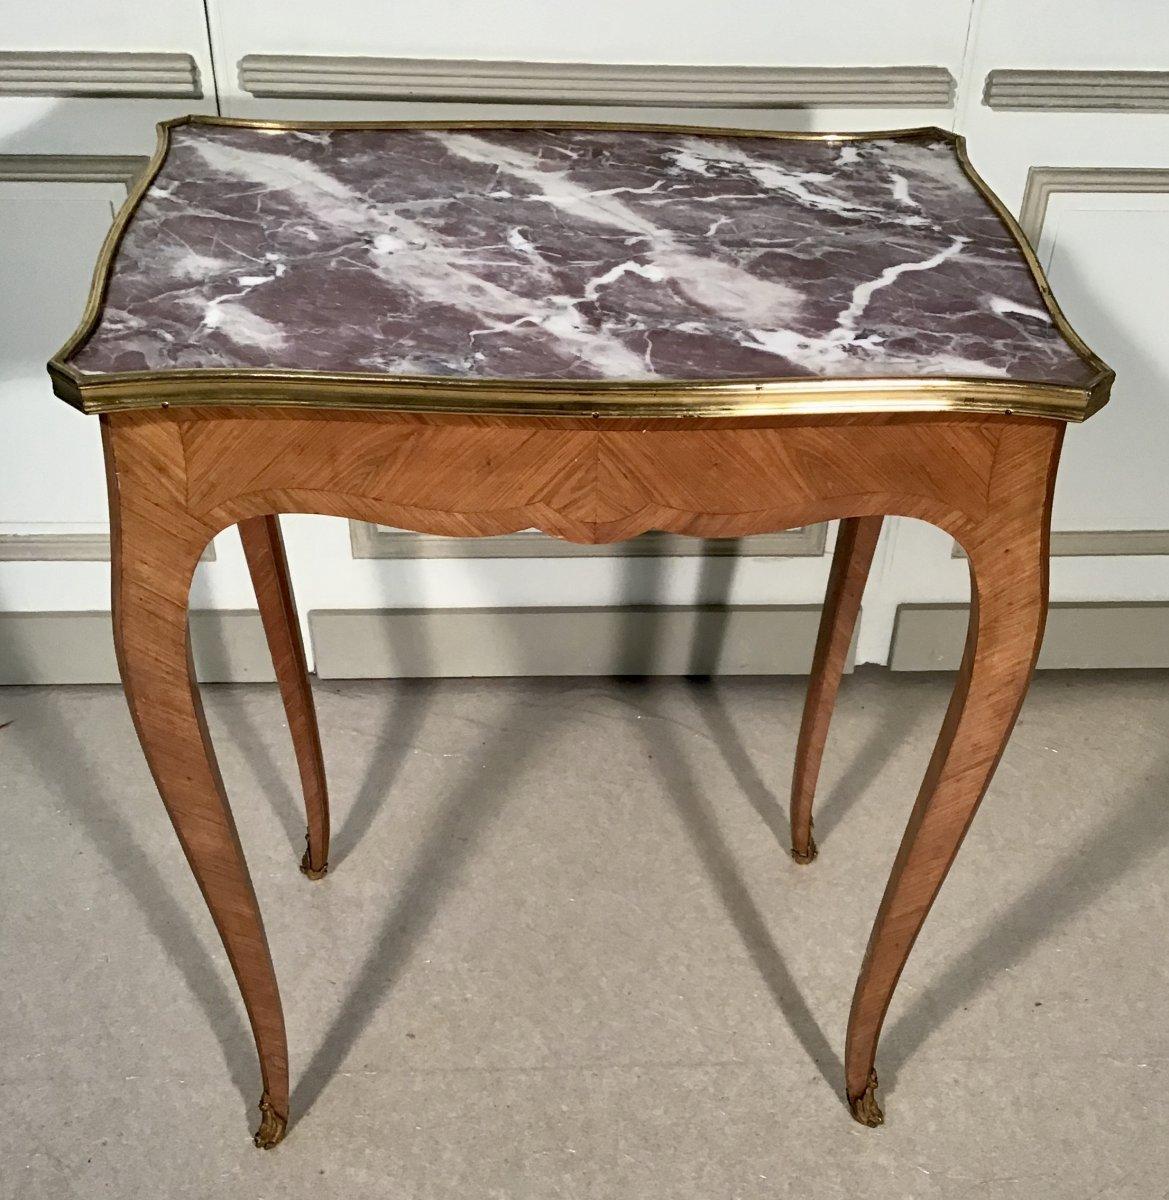 Table Volante Said De Salon Louis XV Style Epoque 19th